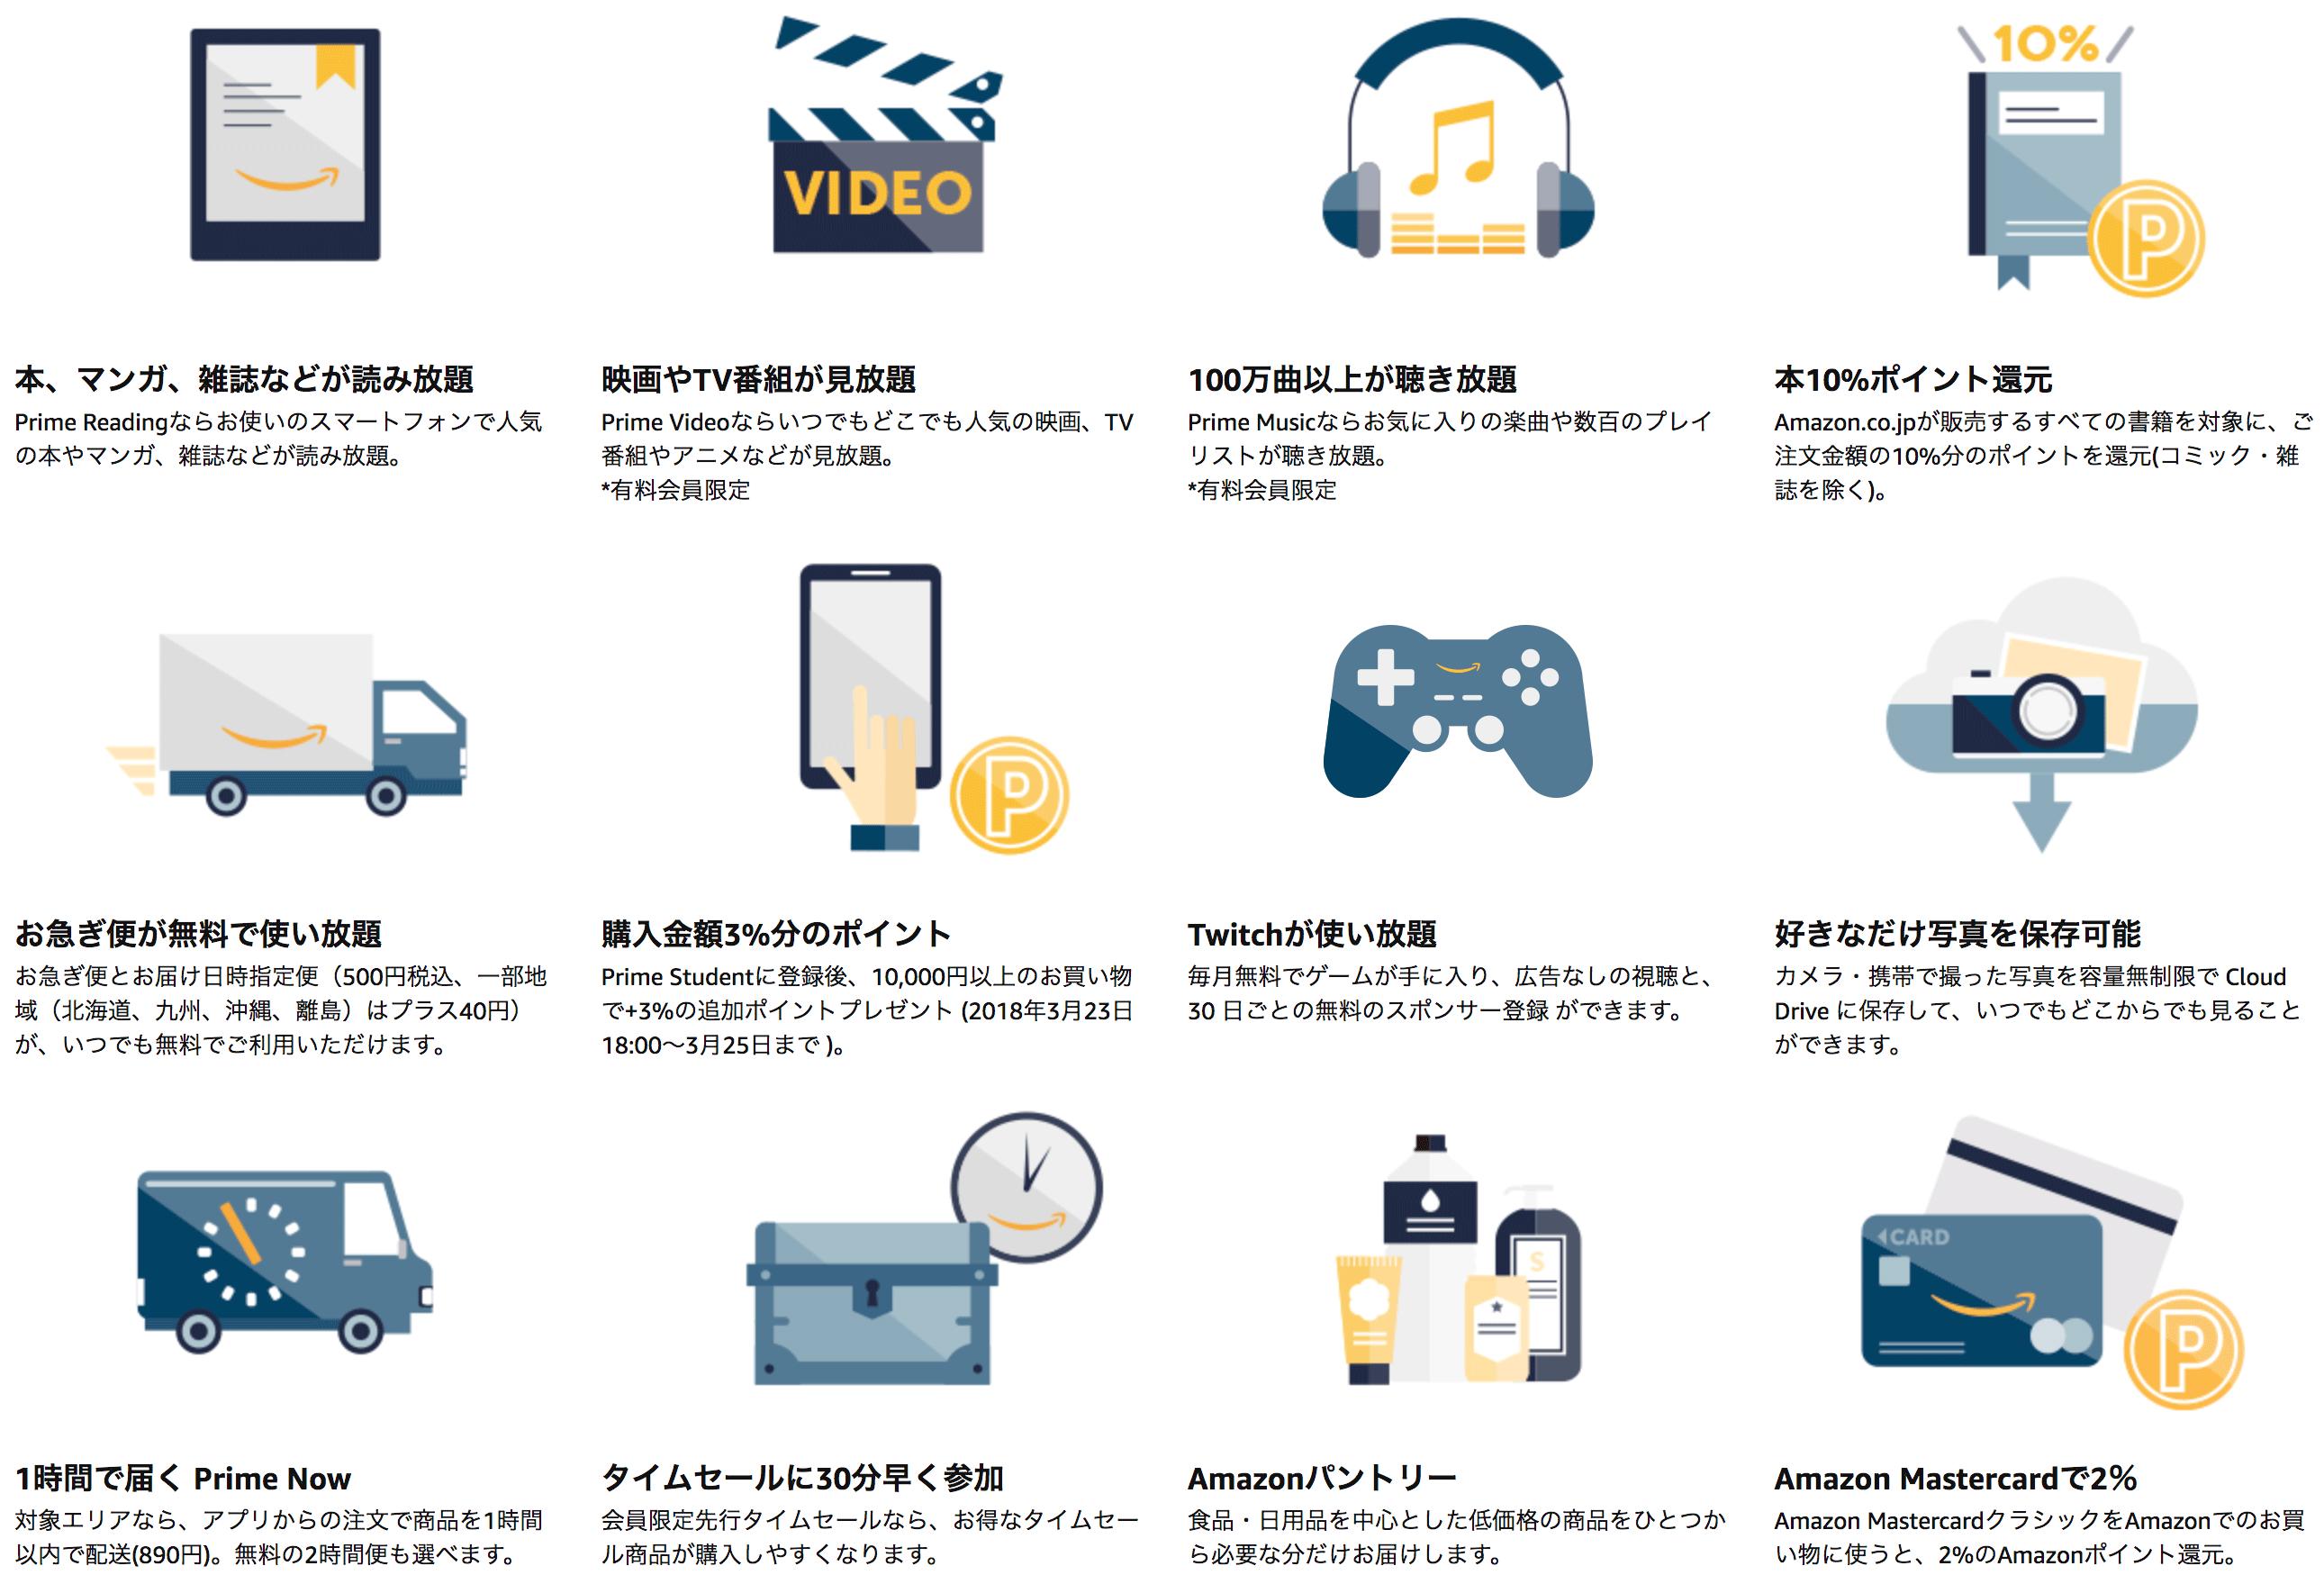 Amazonプライムステューデントの特典